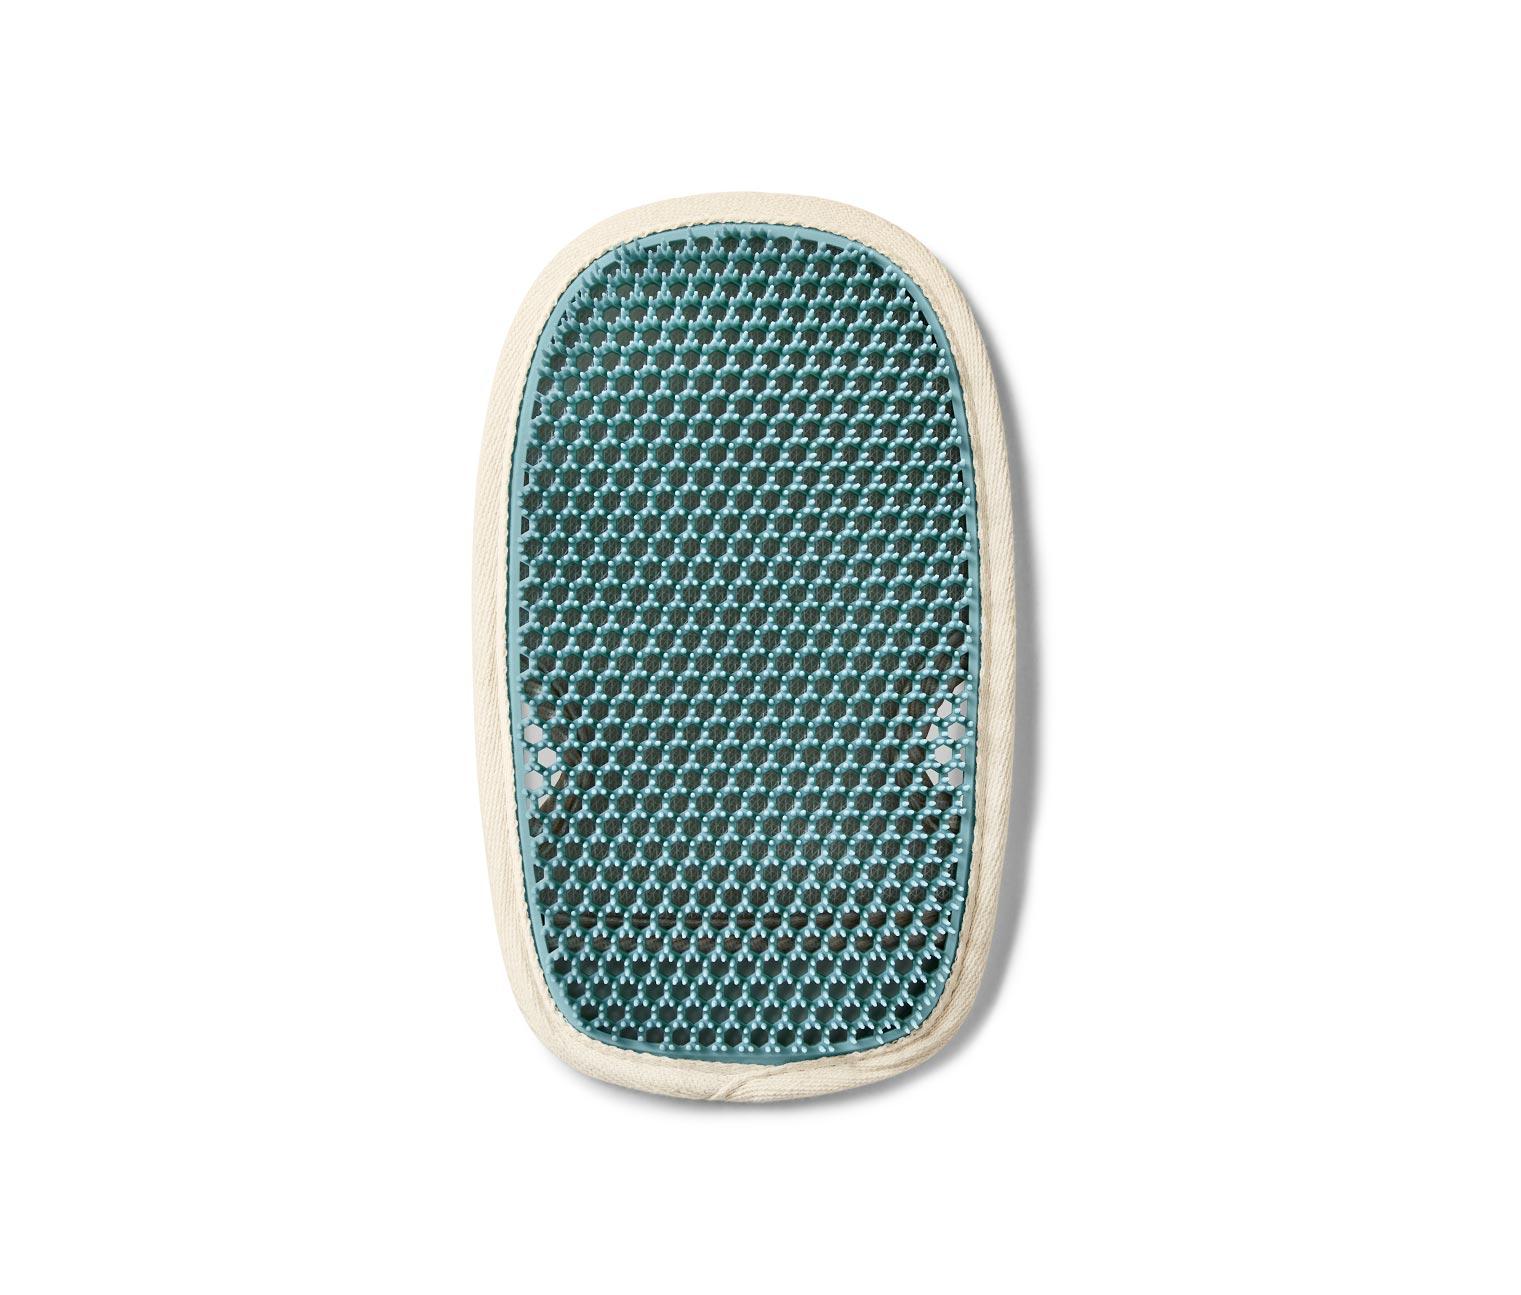 Image of Peeling- und Waschhandschuh